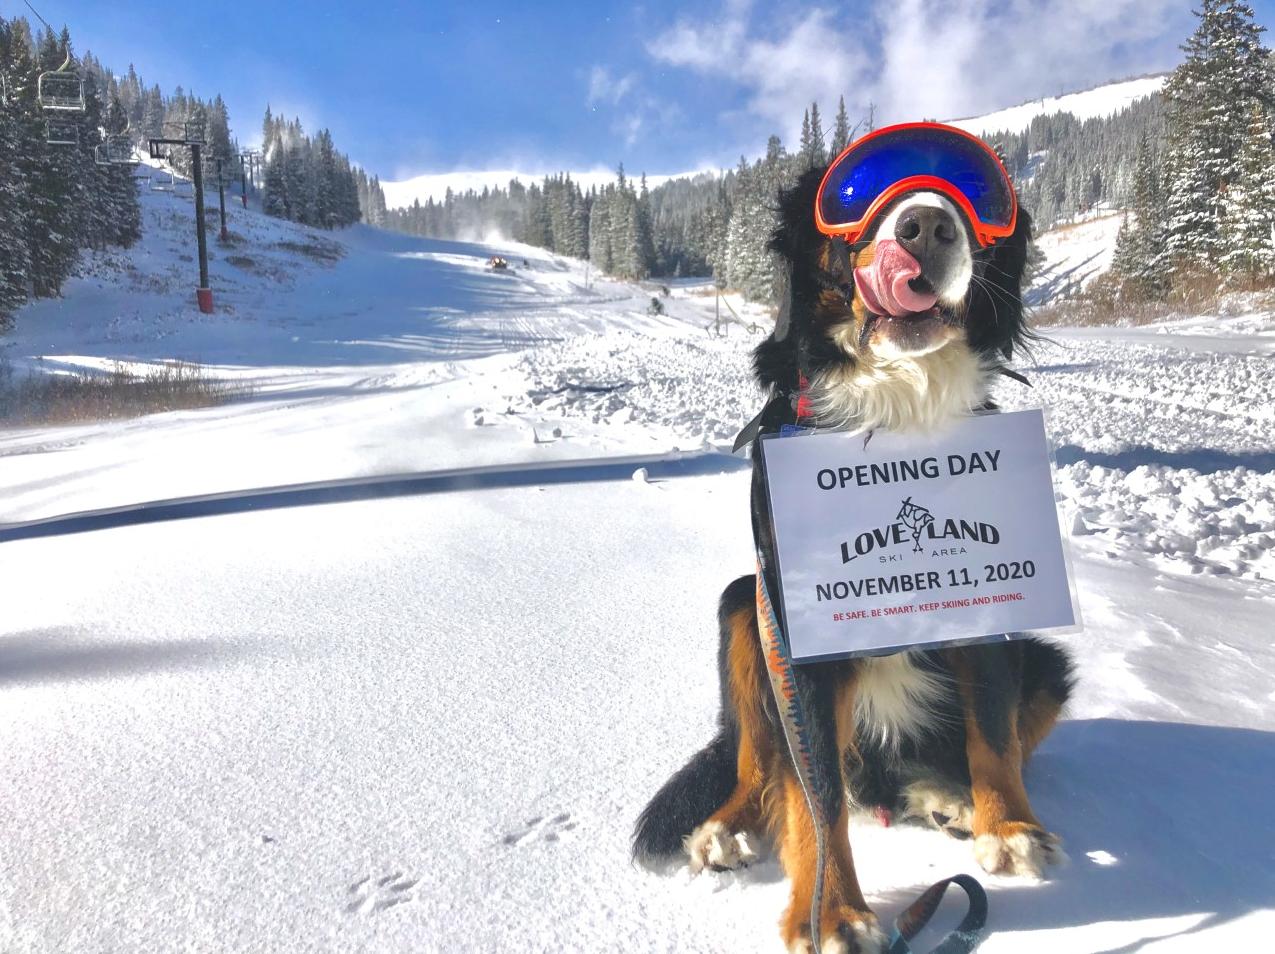 Loveland-Official-Snow-Dog